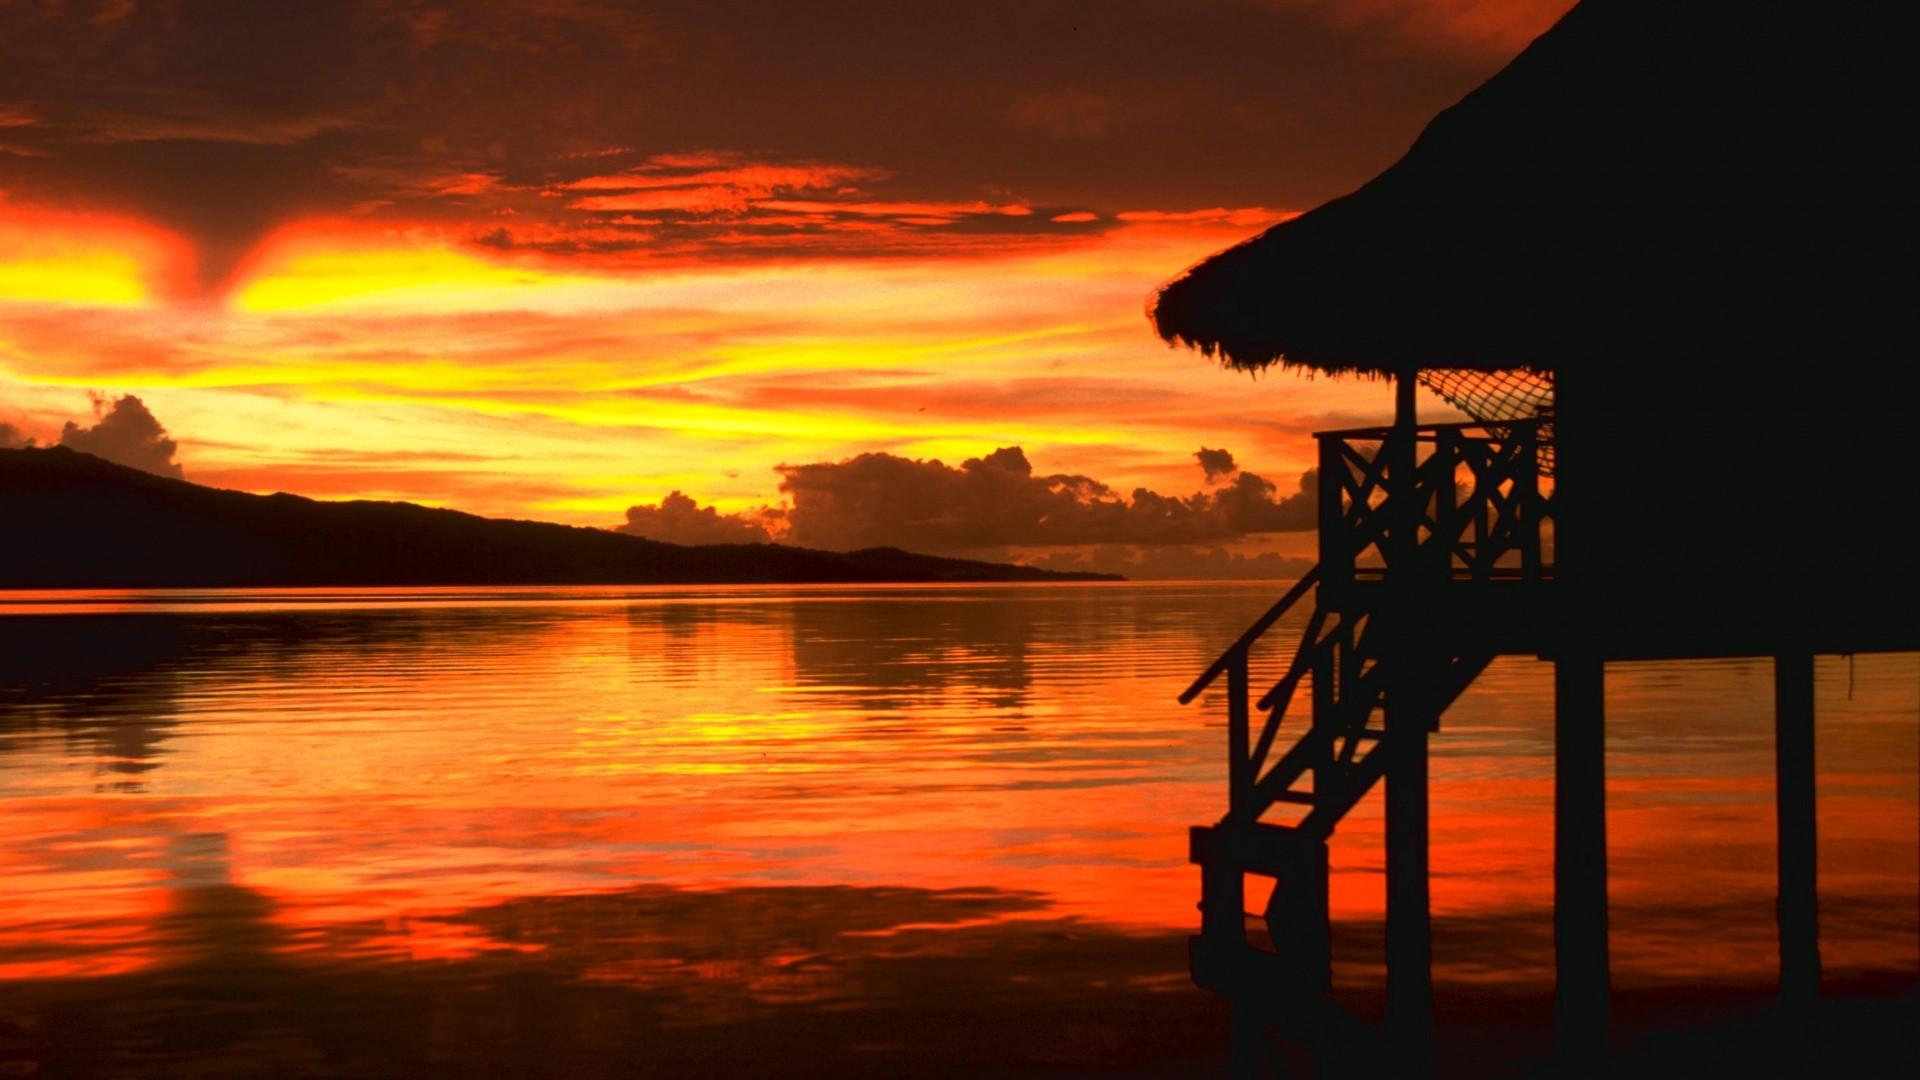 Res: 1920x1080, Beach Sunset Wallpapers Phone : Beach Wallpaper - Rakaruan.com